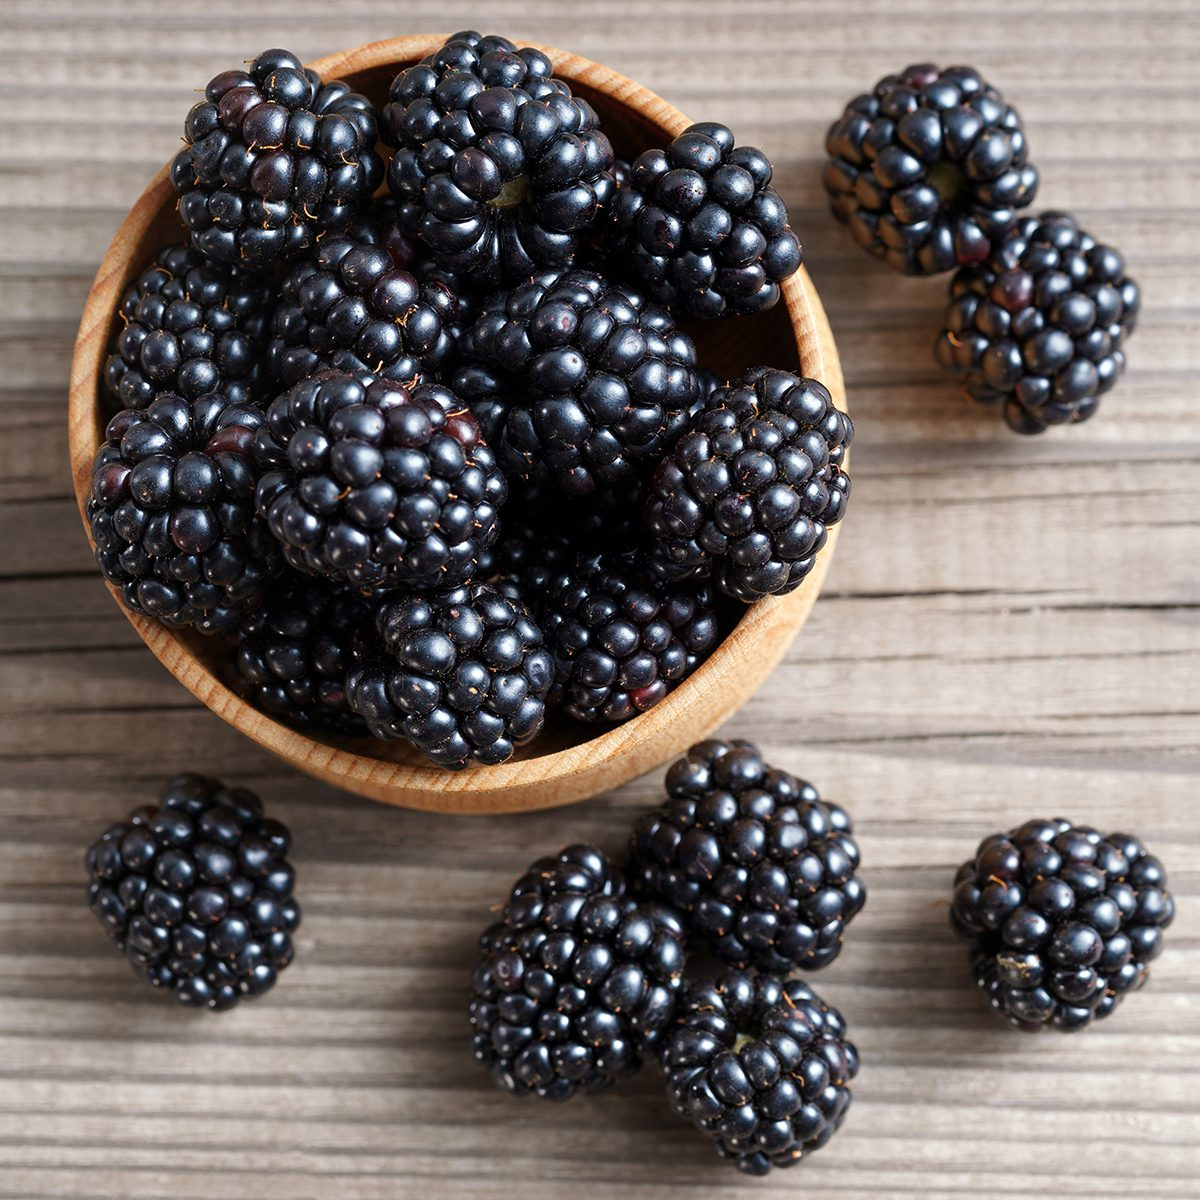 fruits for diabetics Deluxe blackberries in bowl on wooden background.